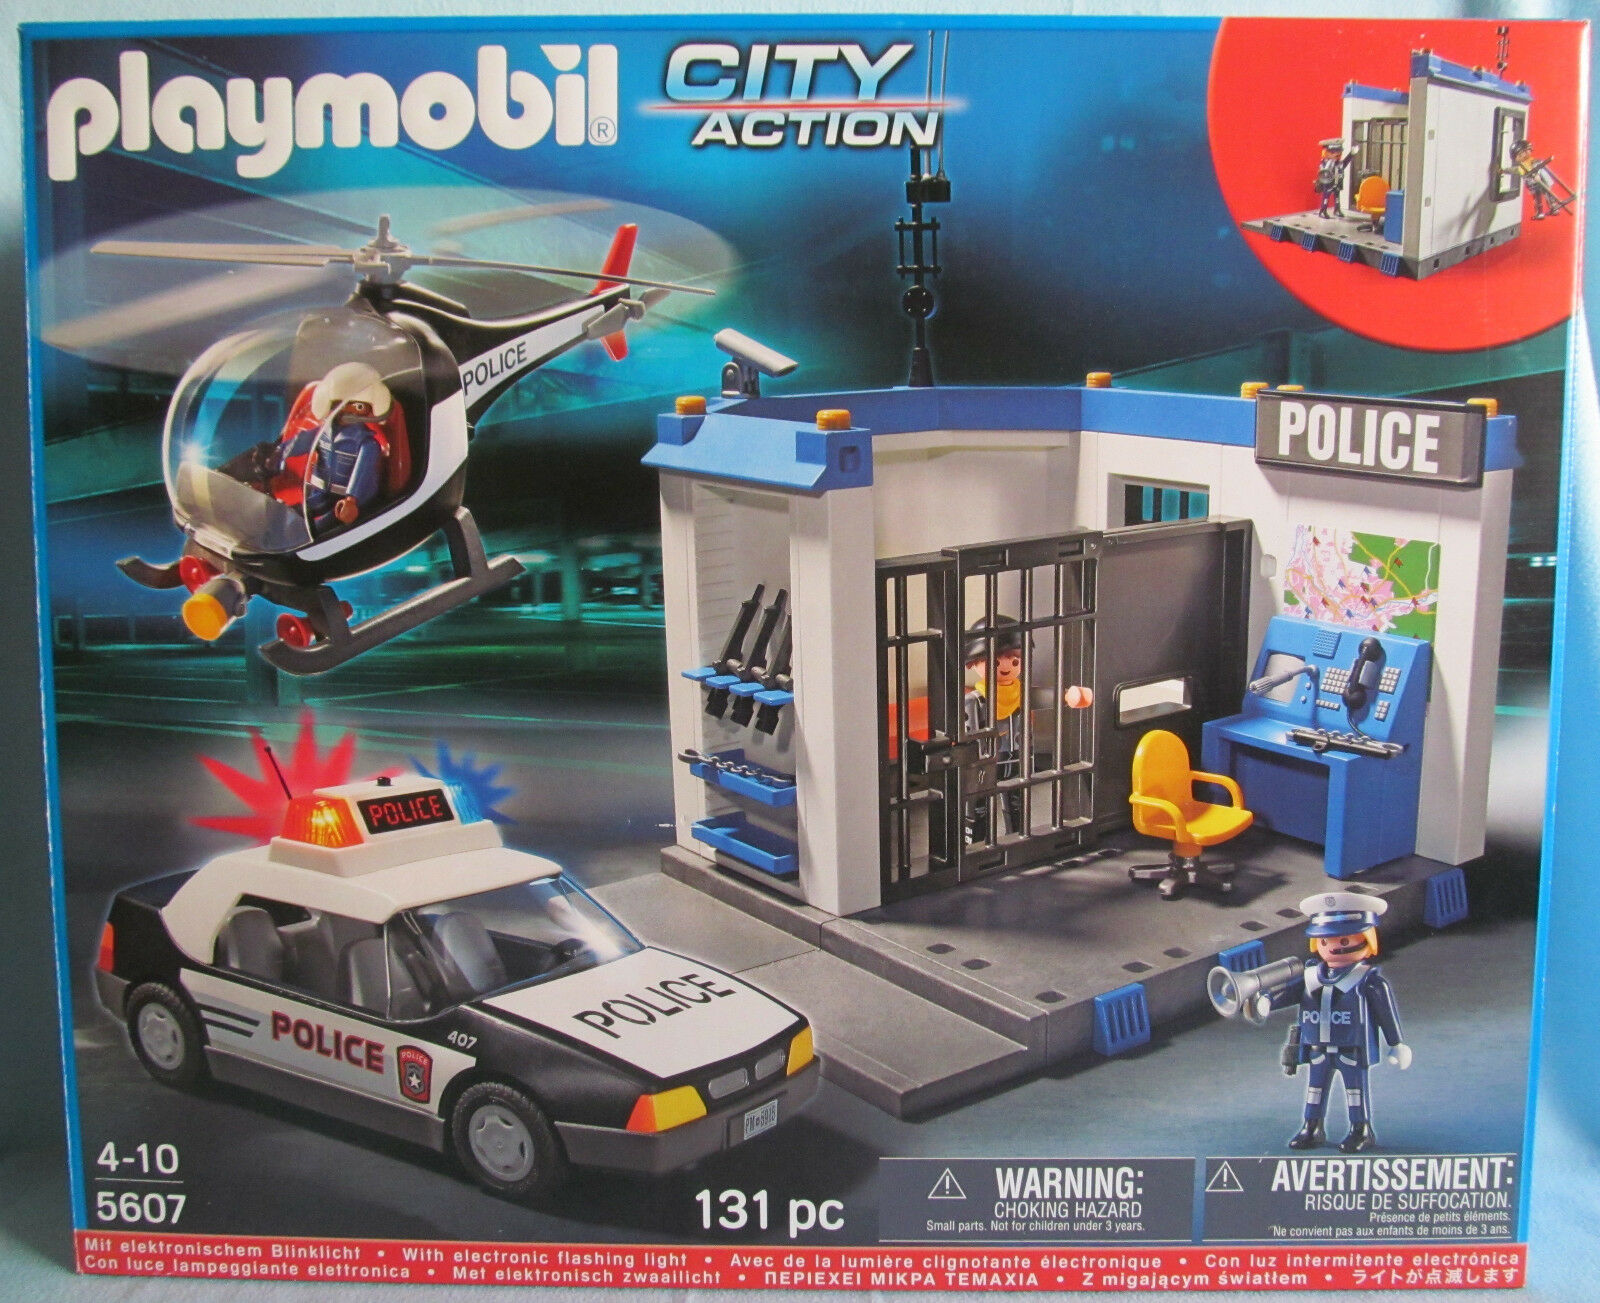 PLAYMOBIL CITY ACTION 5607 5607 5607 Polizei-Set, POLICE, v. 2012, Blinklicht, OVP, TOP ce85ee